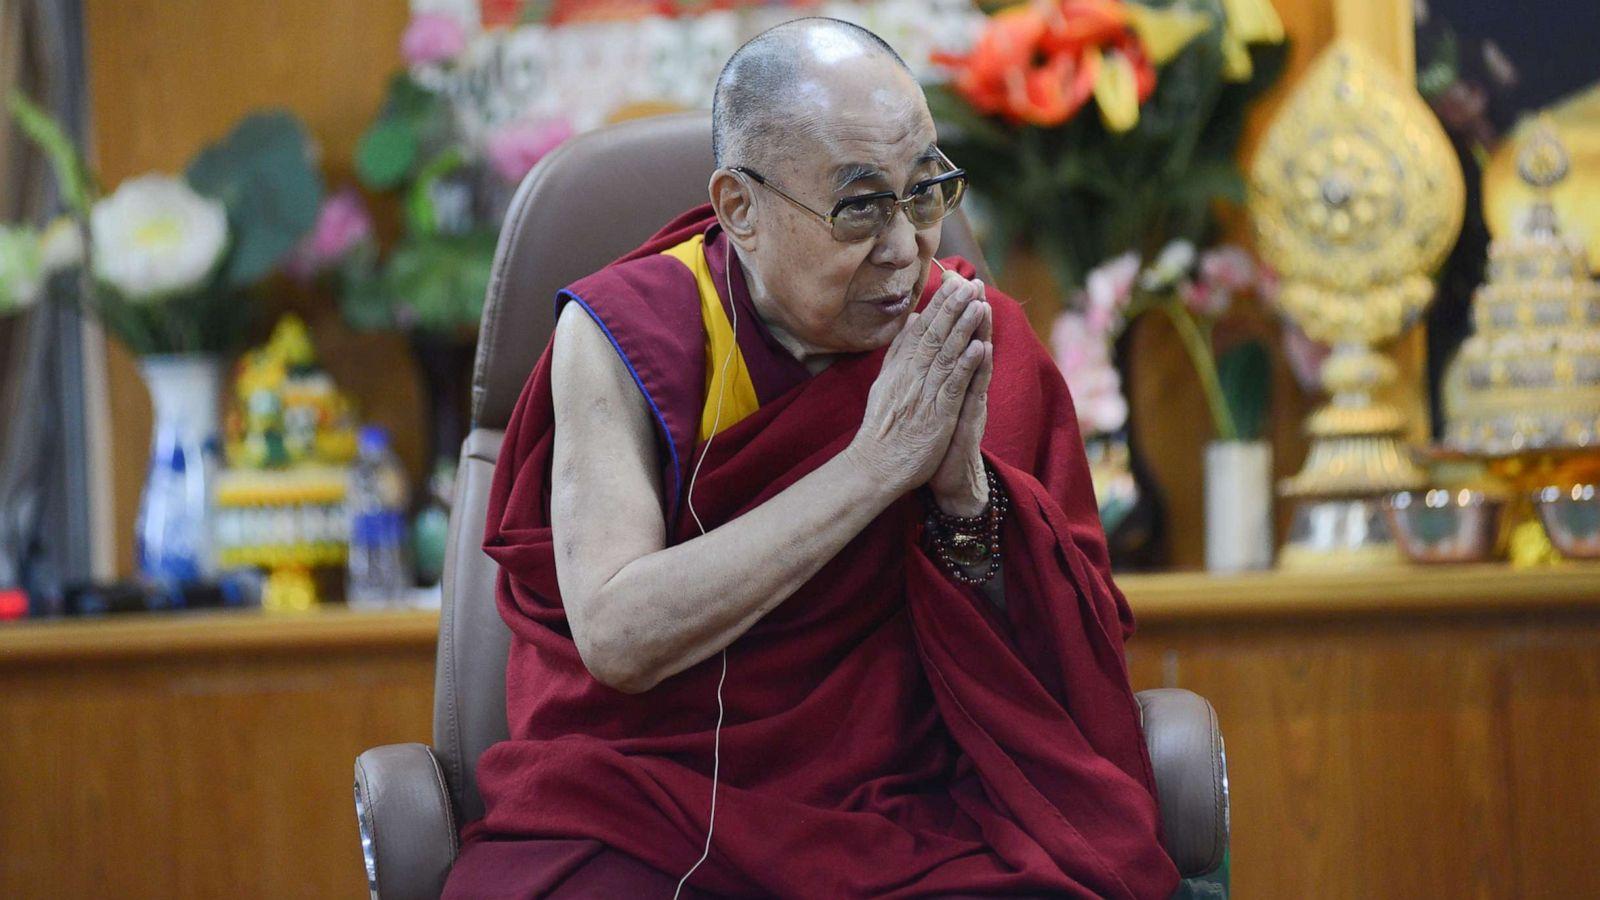 The Dalai Lama S Simple Advice To Navigating Covid 19 Isolation Abc News